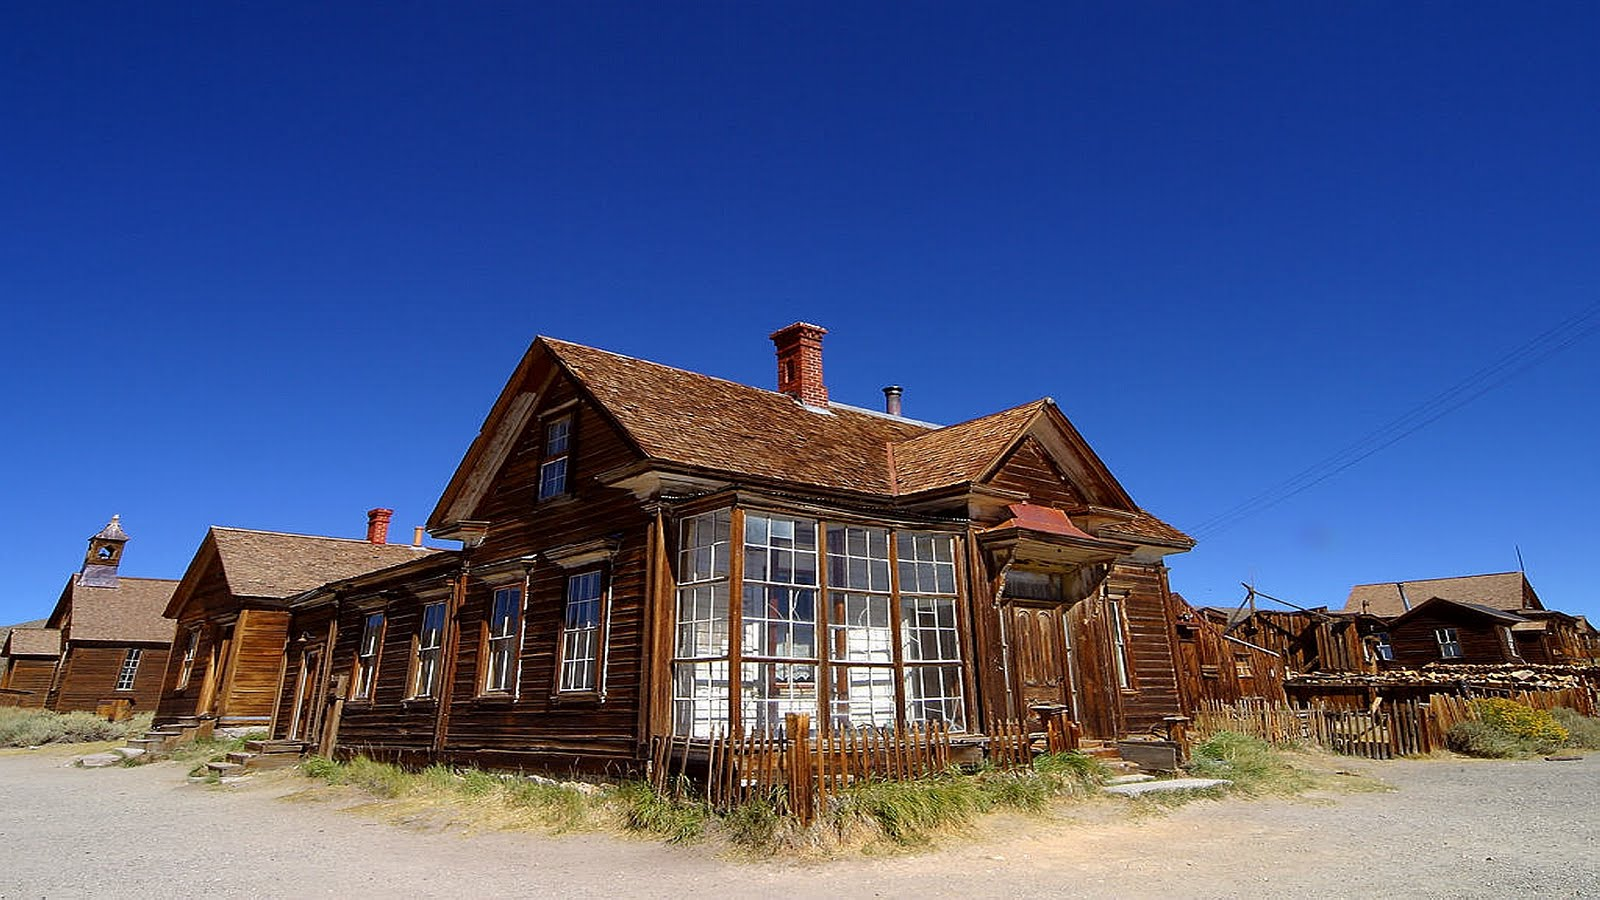 http://2.bp.blogspot.com/-pQY7Qc89ovU/TlyrjroCMZI/AAAAAAAAAEc/916mcUCZOAY/s1600/bodie-ghost-town-photography-art-image.jpg